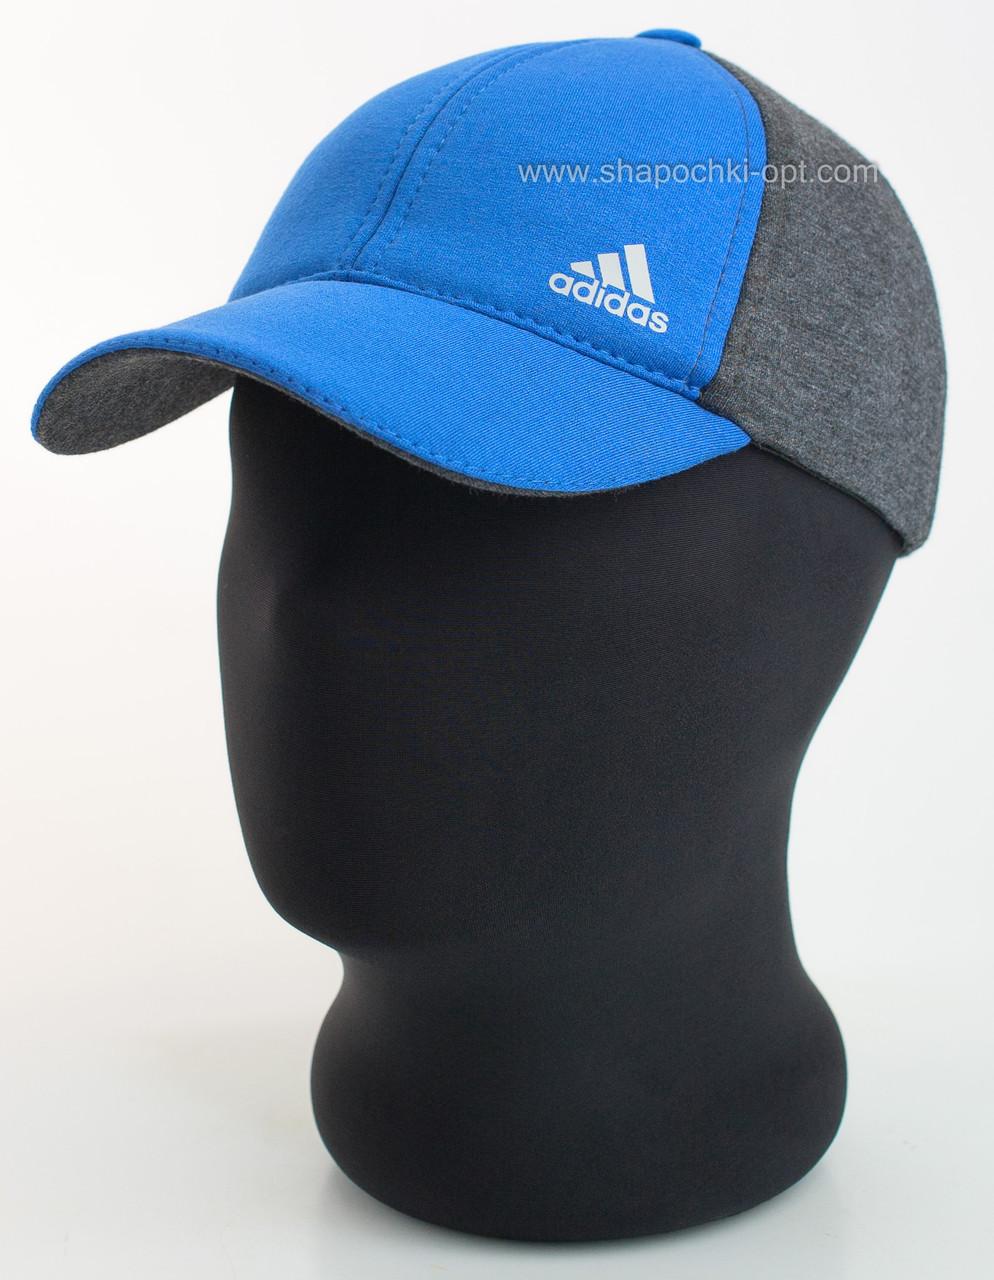 Двухцветная бейсболка c логотипом Adidas электрик+темно-серый, Сахара шестиклинка комби